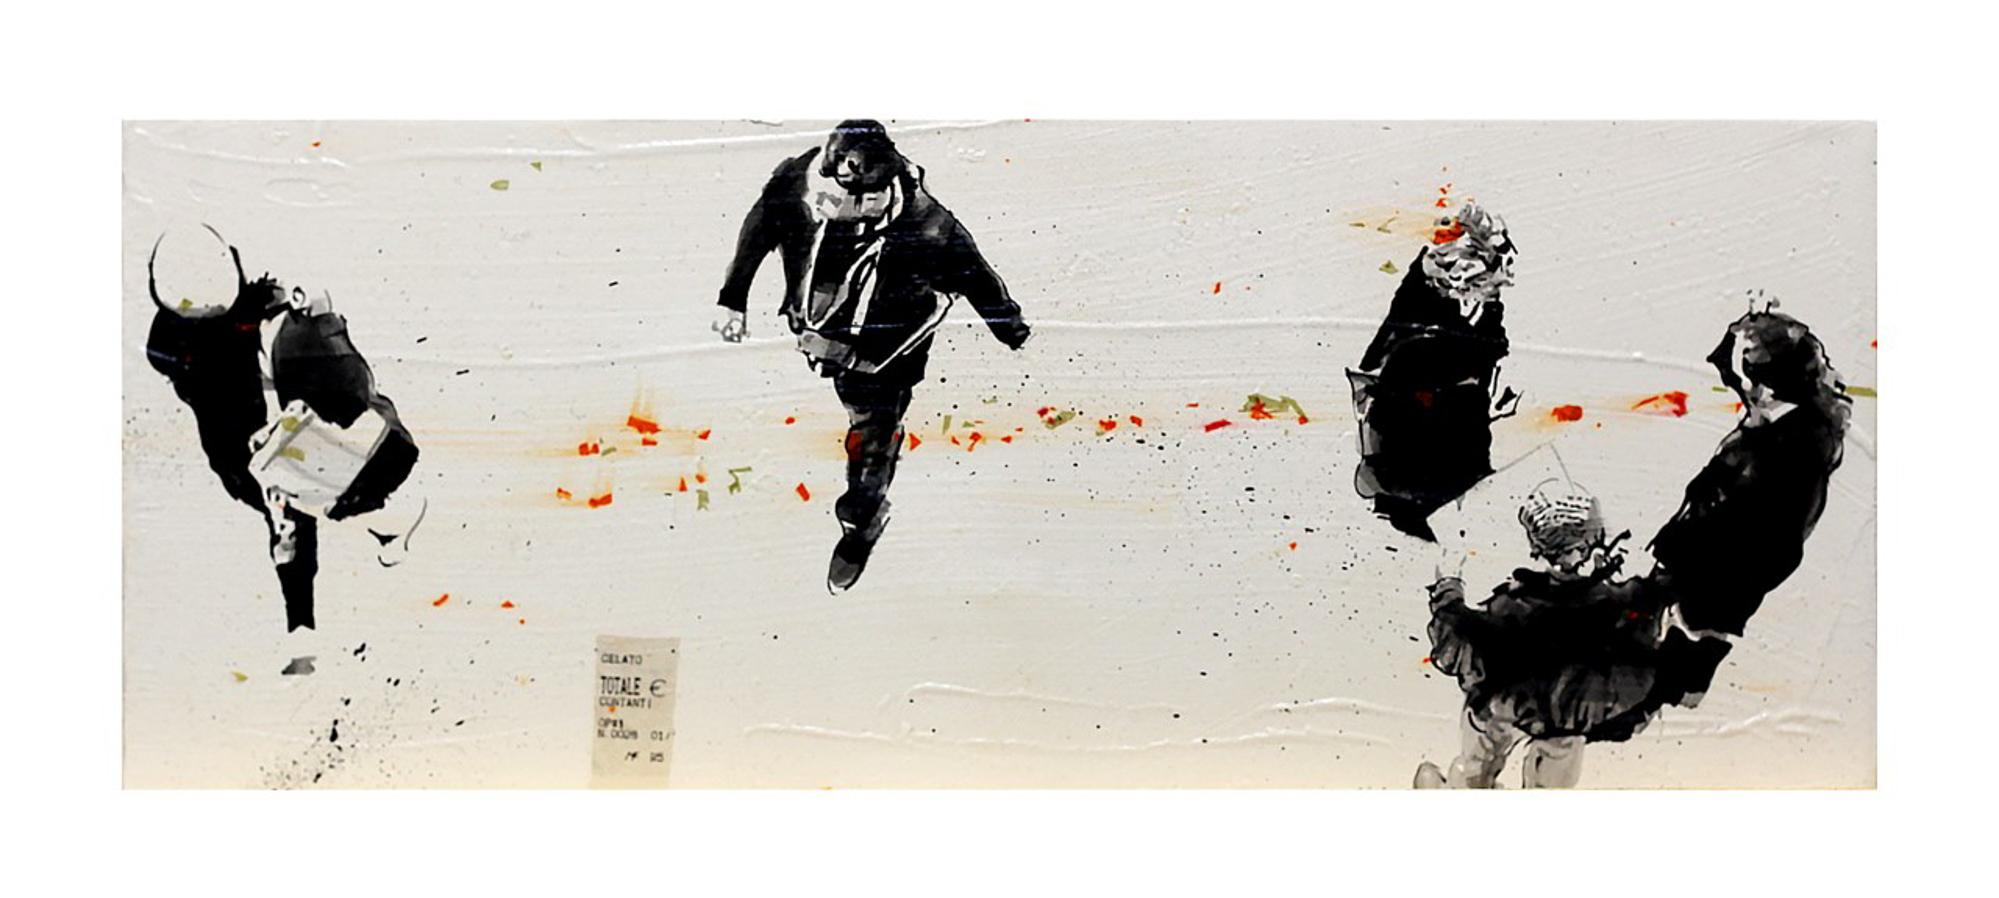 Walking White by Federico Arcuri